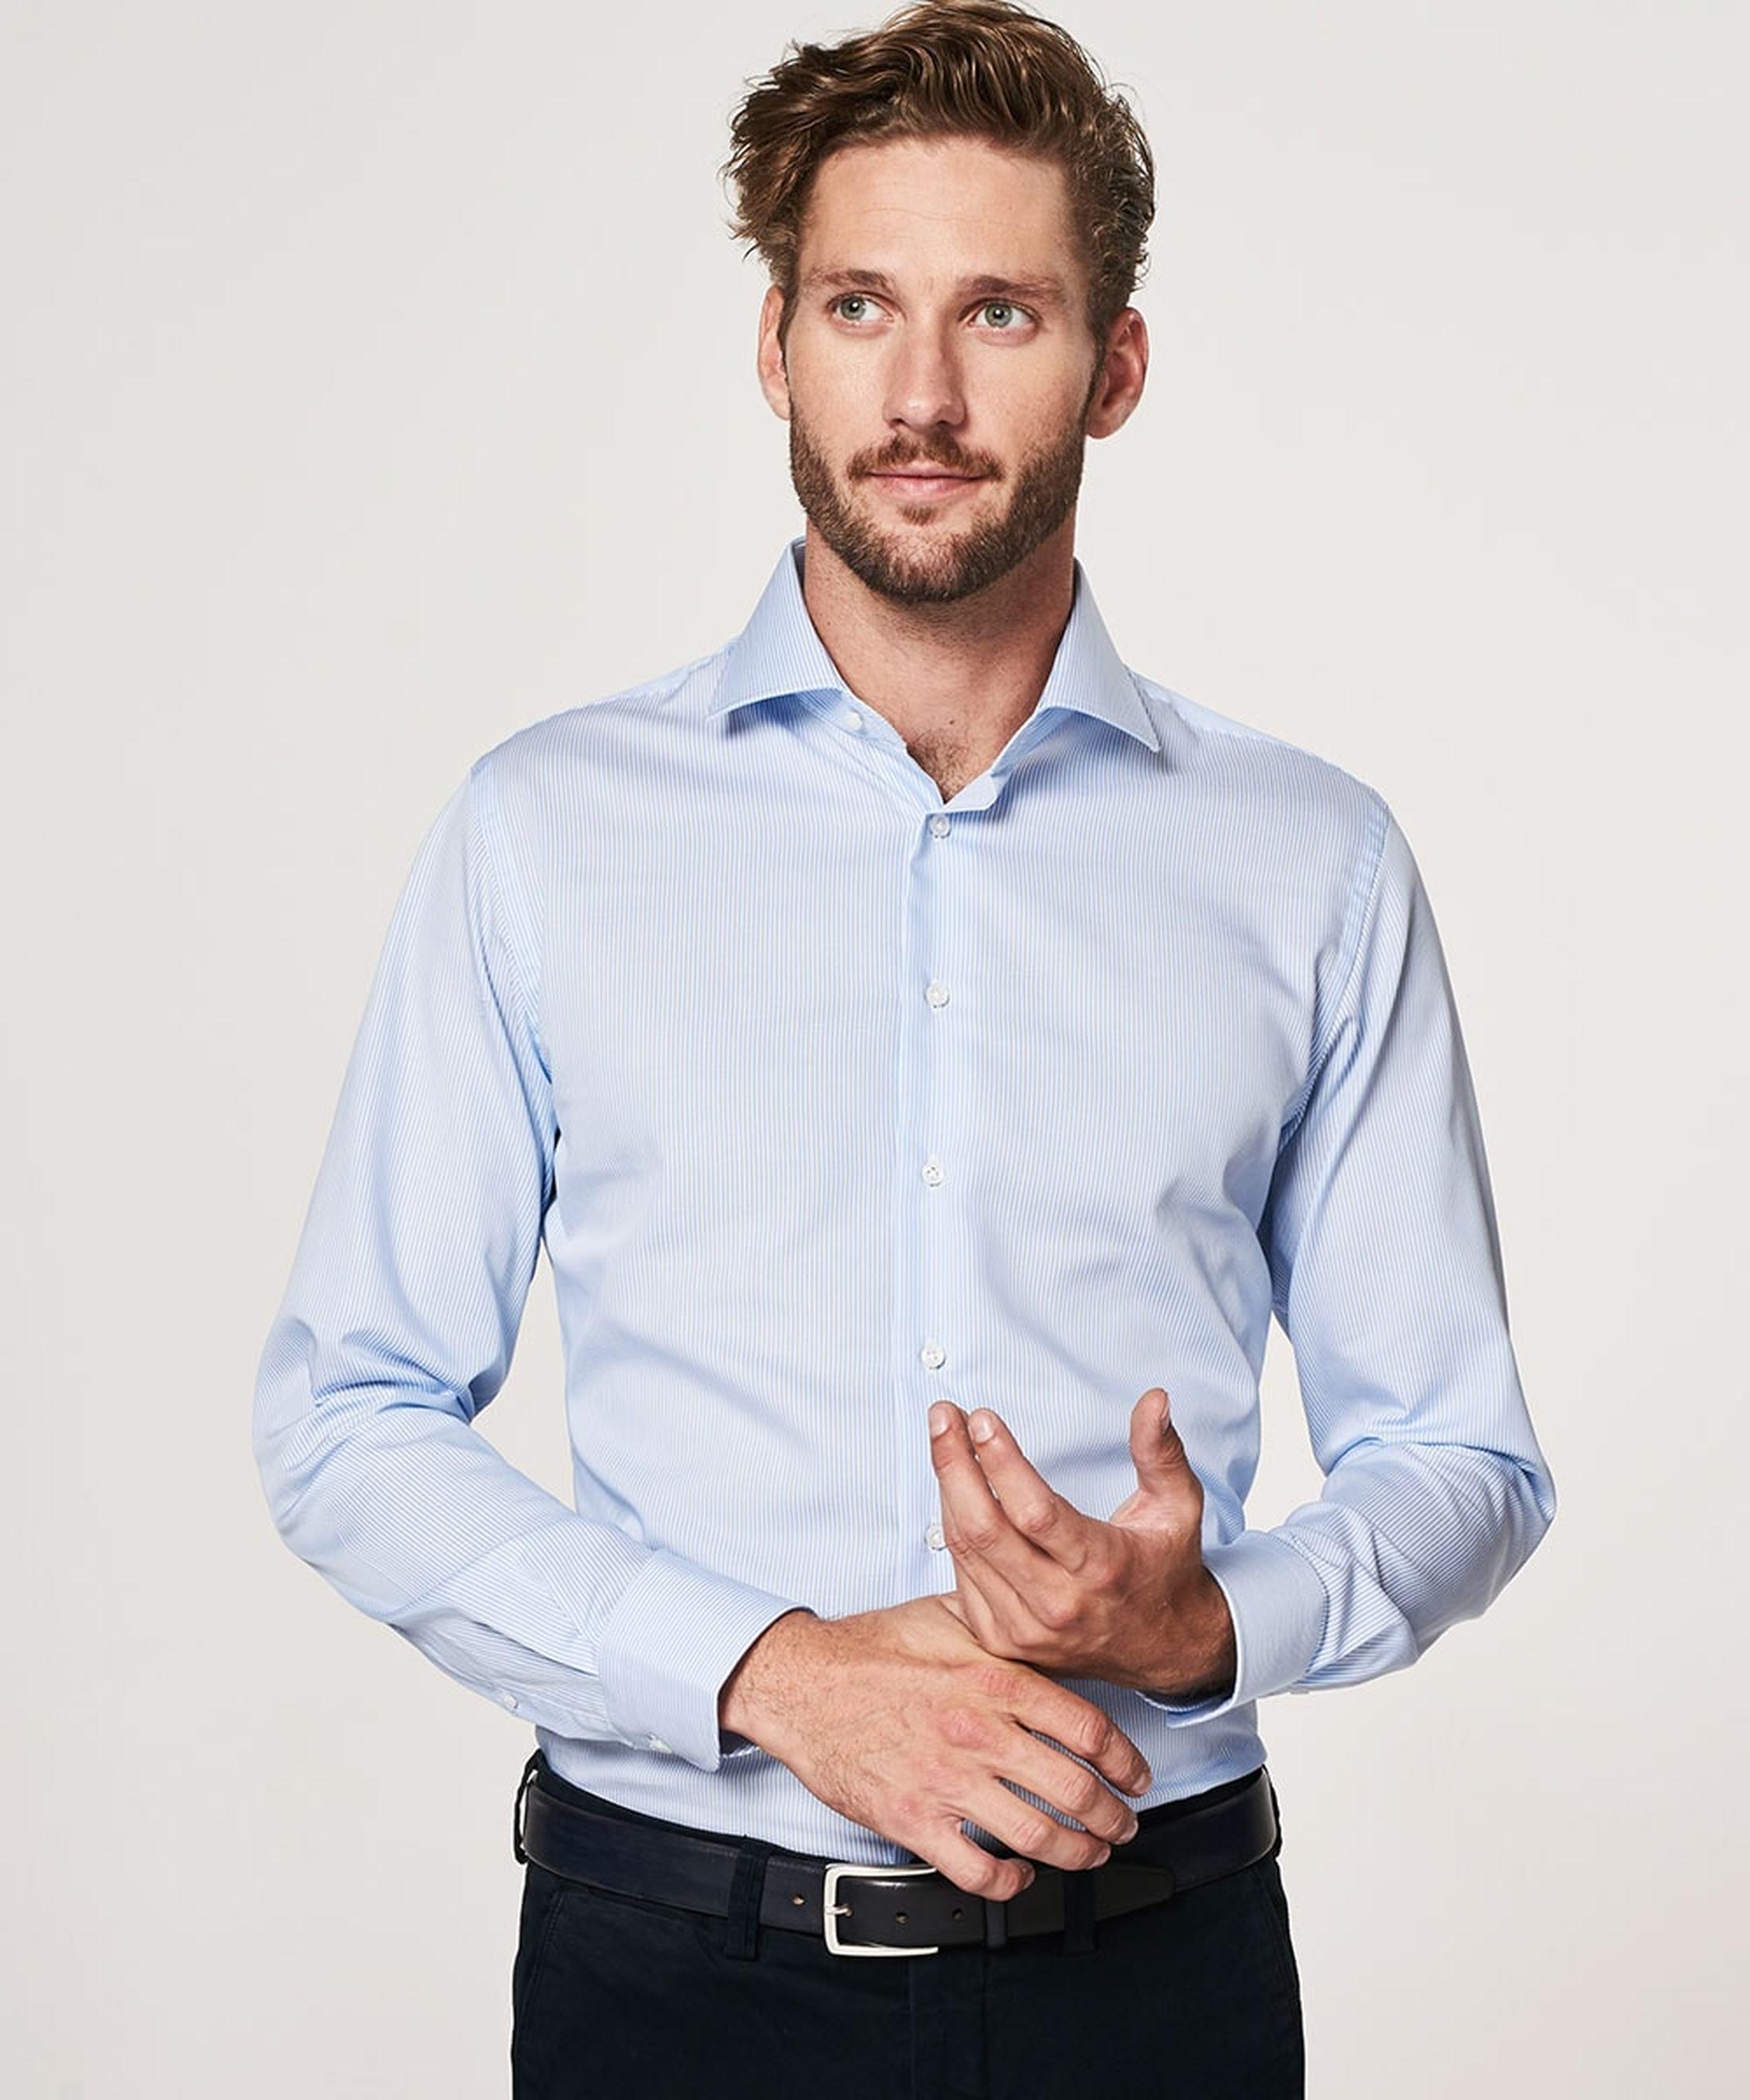 Profuomo Shirt Light Blue Striped foto 3